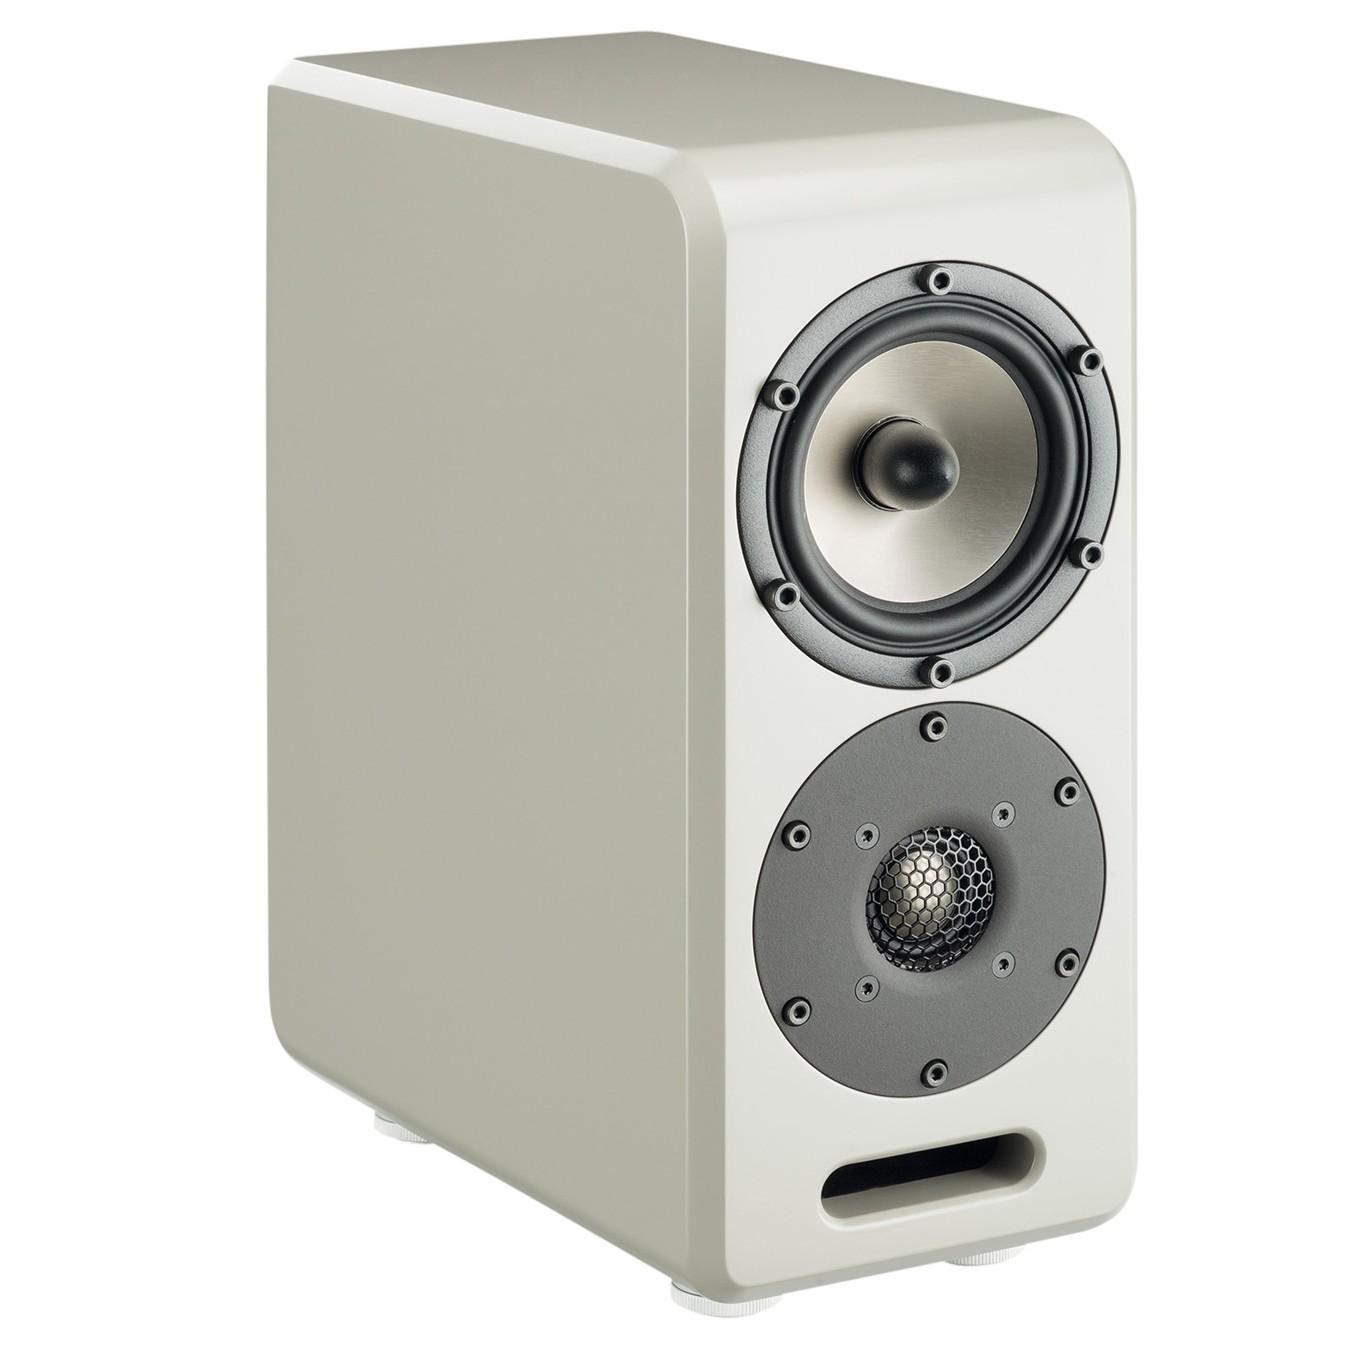 Lautsprecher Stereo Inklang Advanced Line 10.2 im Test, Bild 5